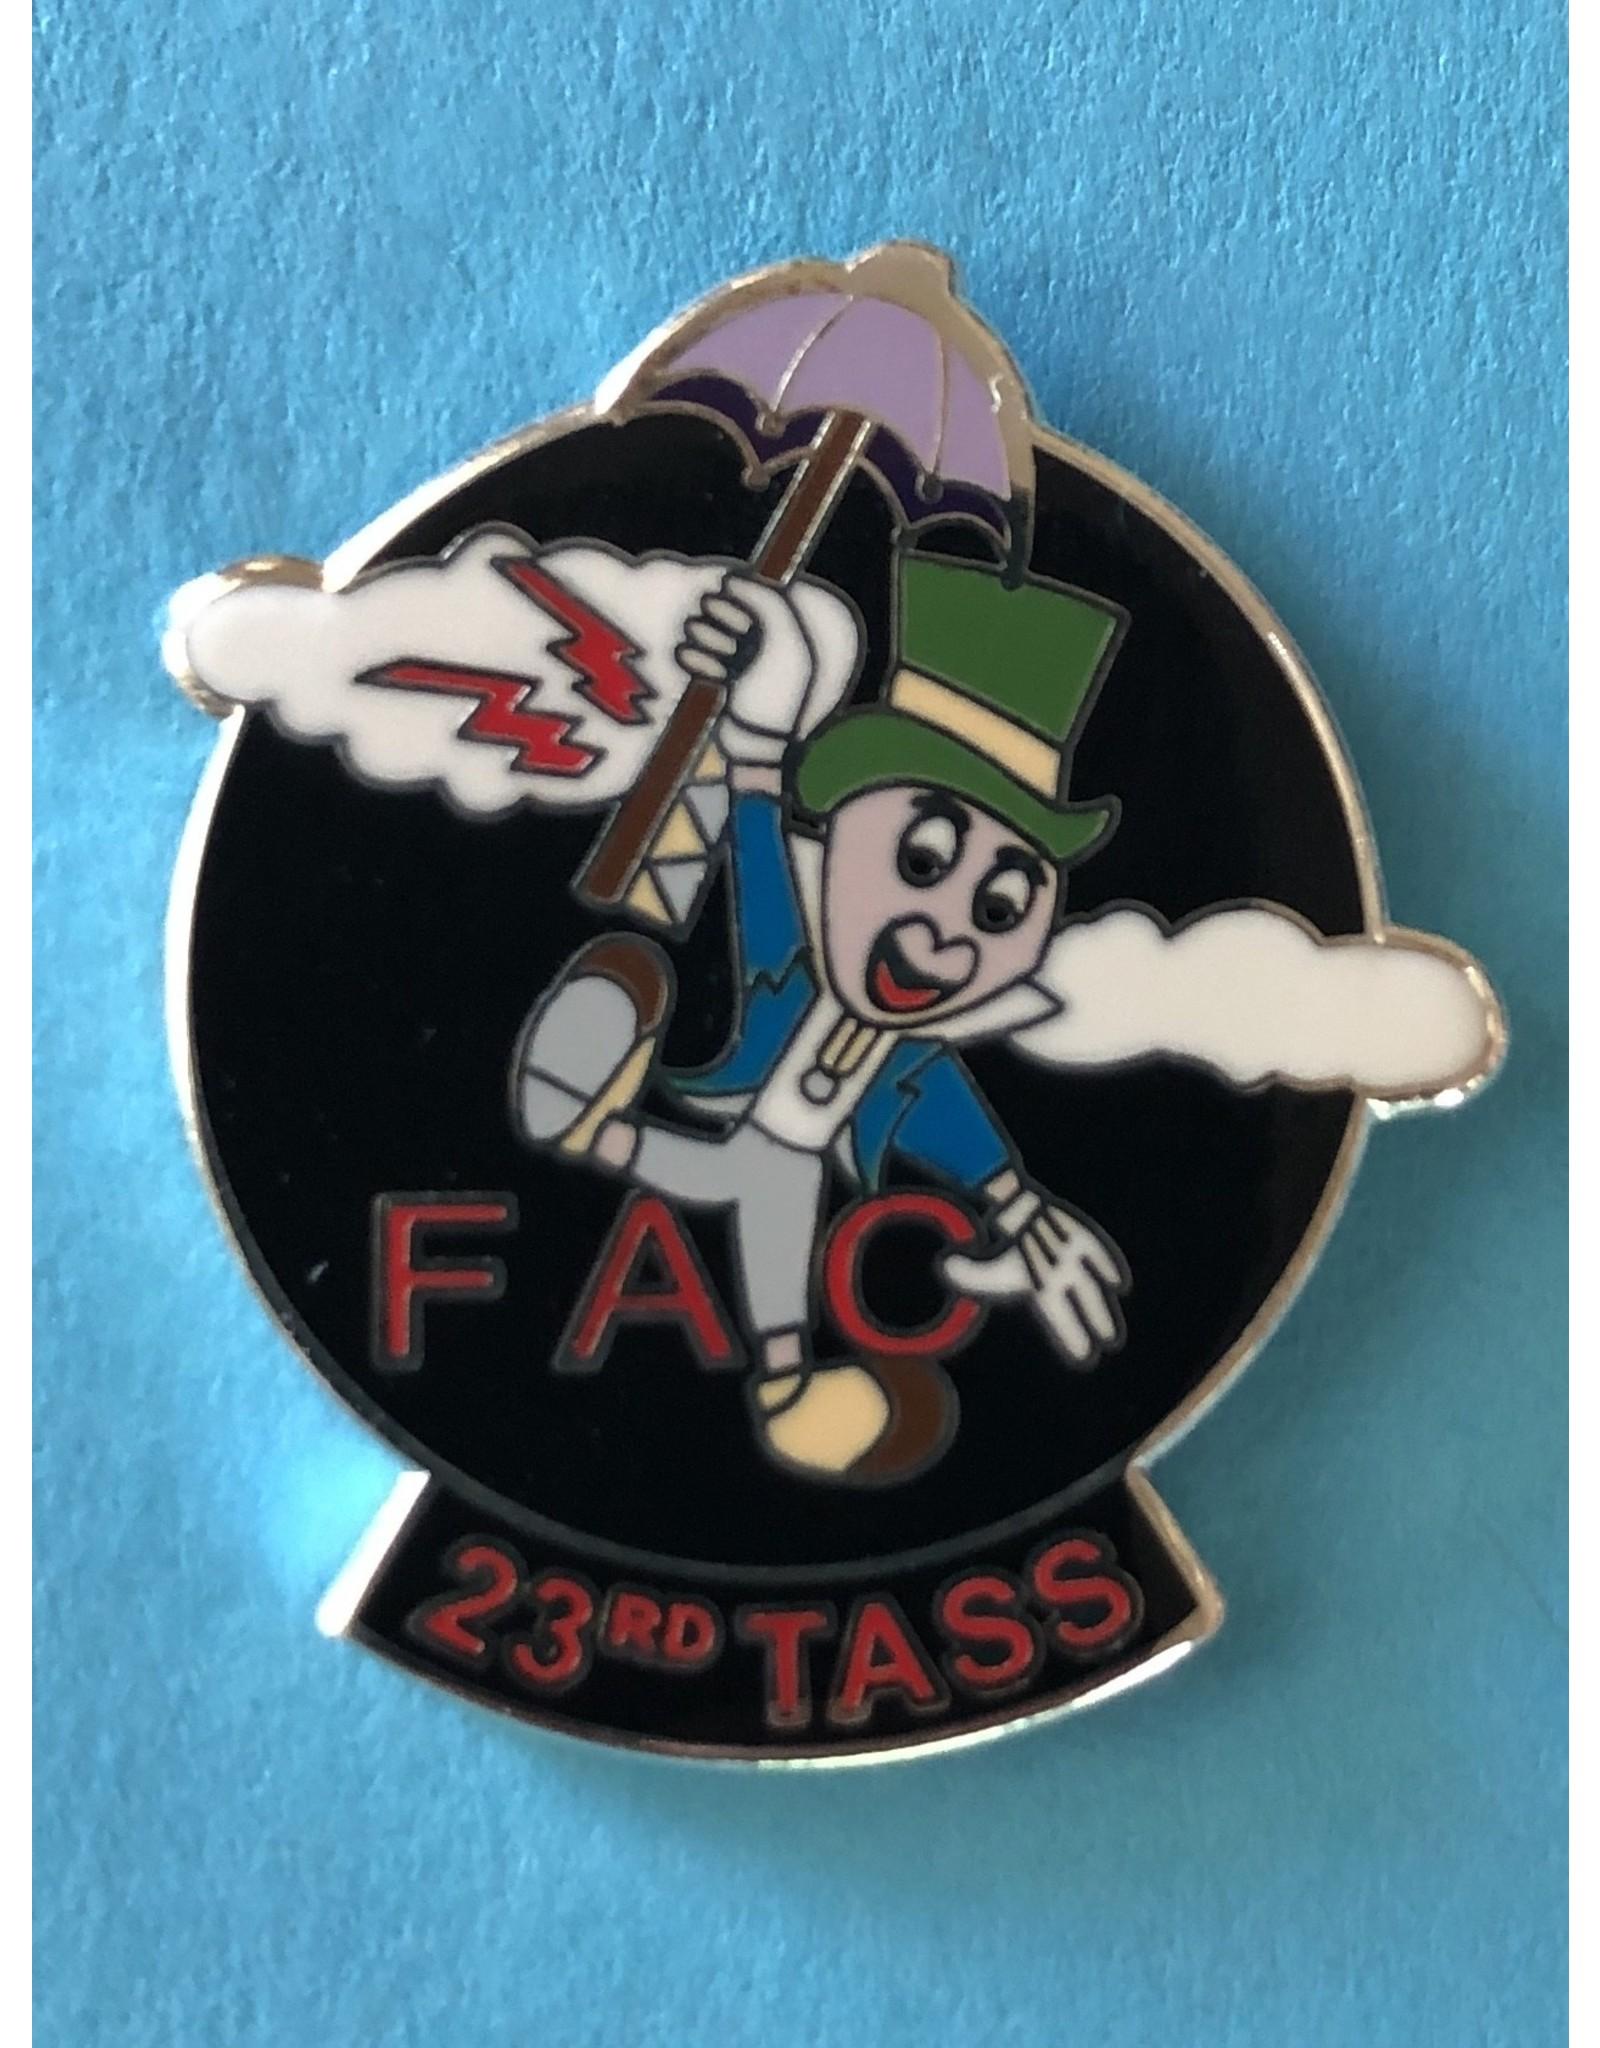 FAC Assoc USAF 23rd TASS FAC, Pin, night